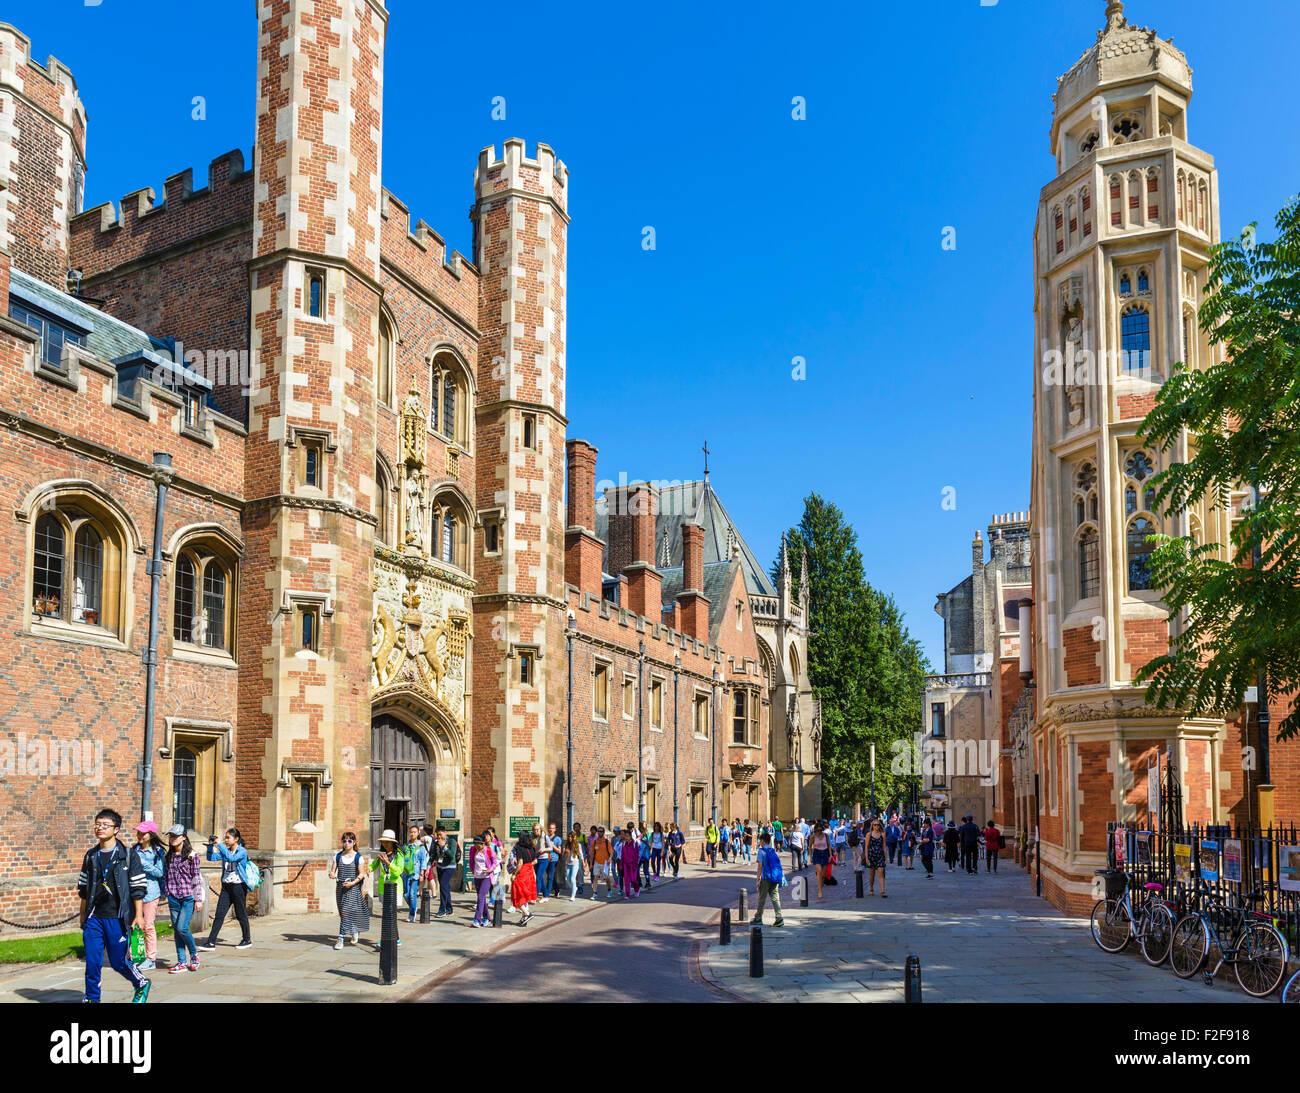 St Johns Street outside St John's College, Cambridge University, Cambridge, Cambridgeshire, England, UK - Stock Image